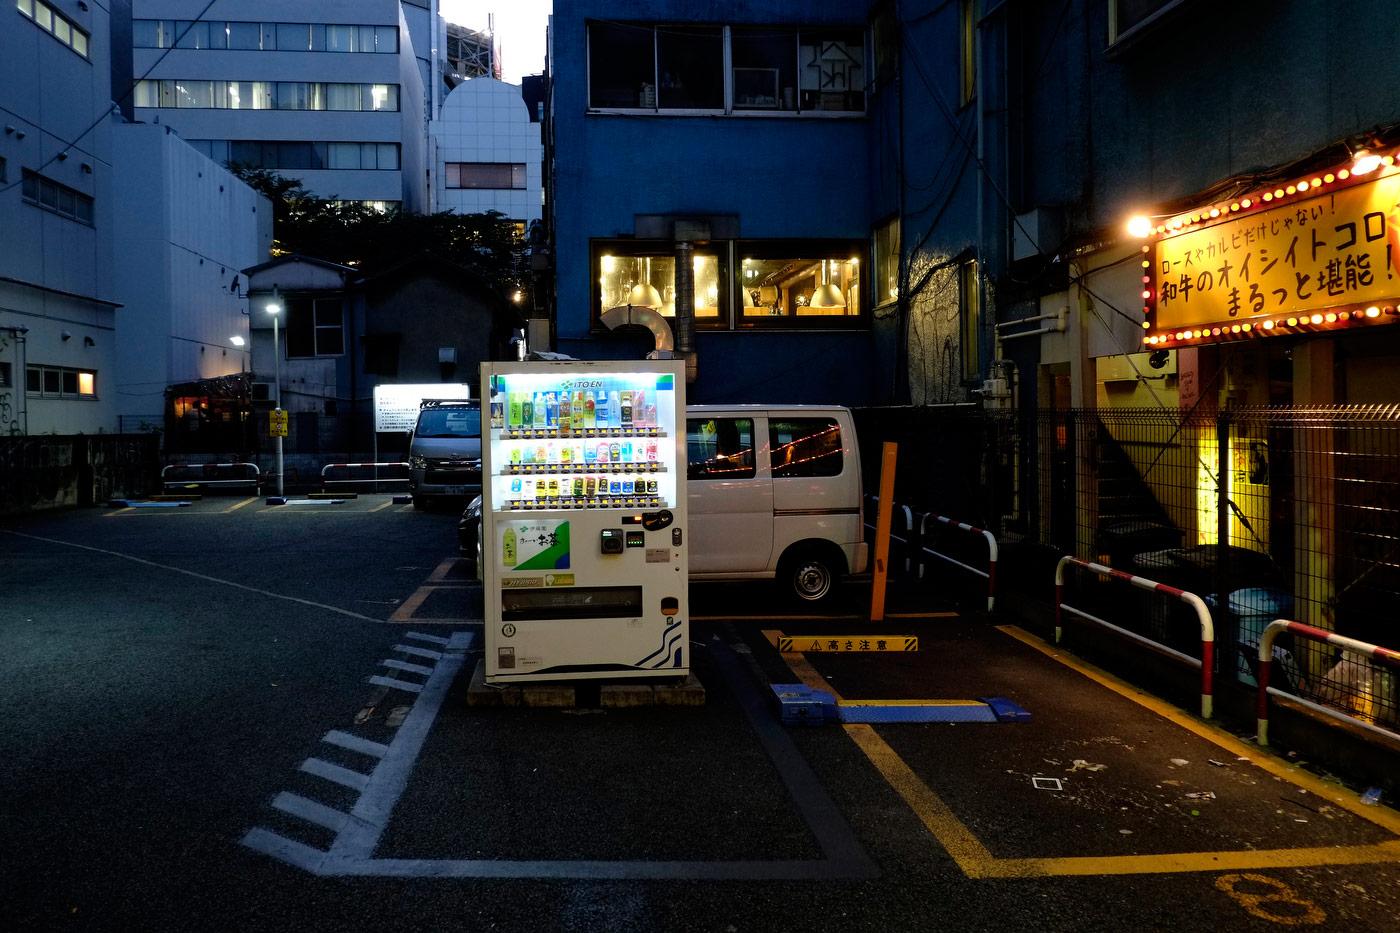 Shibuya, Tokyo, Japan © Dan Himbrechts